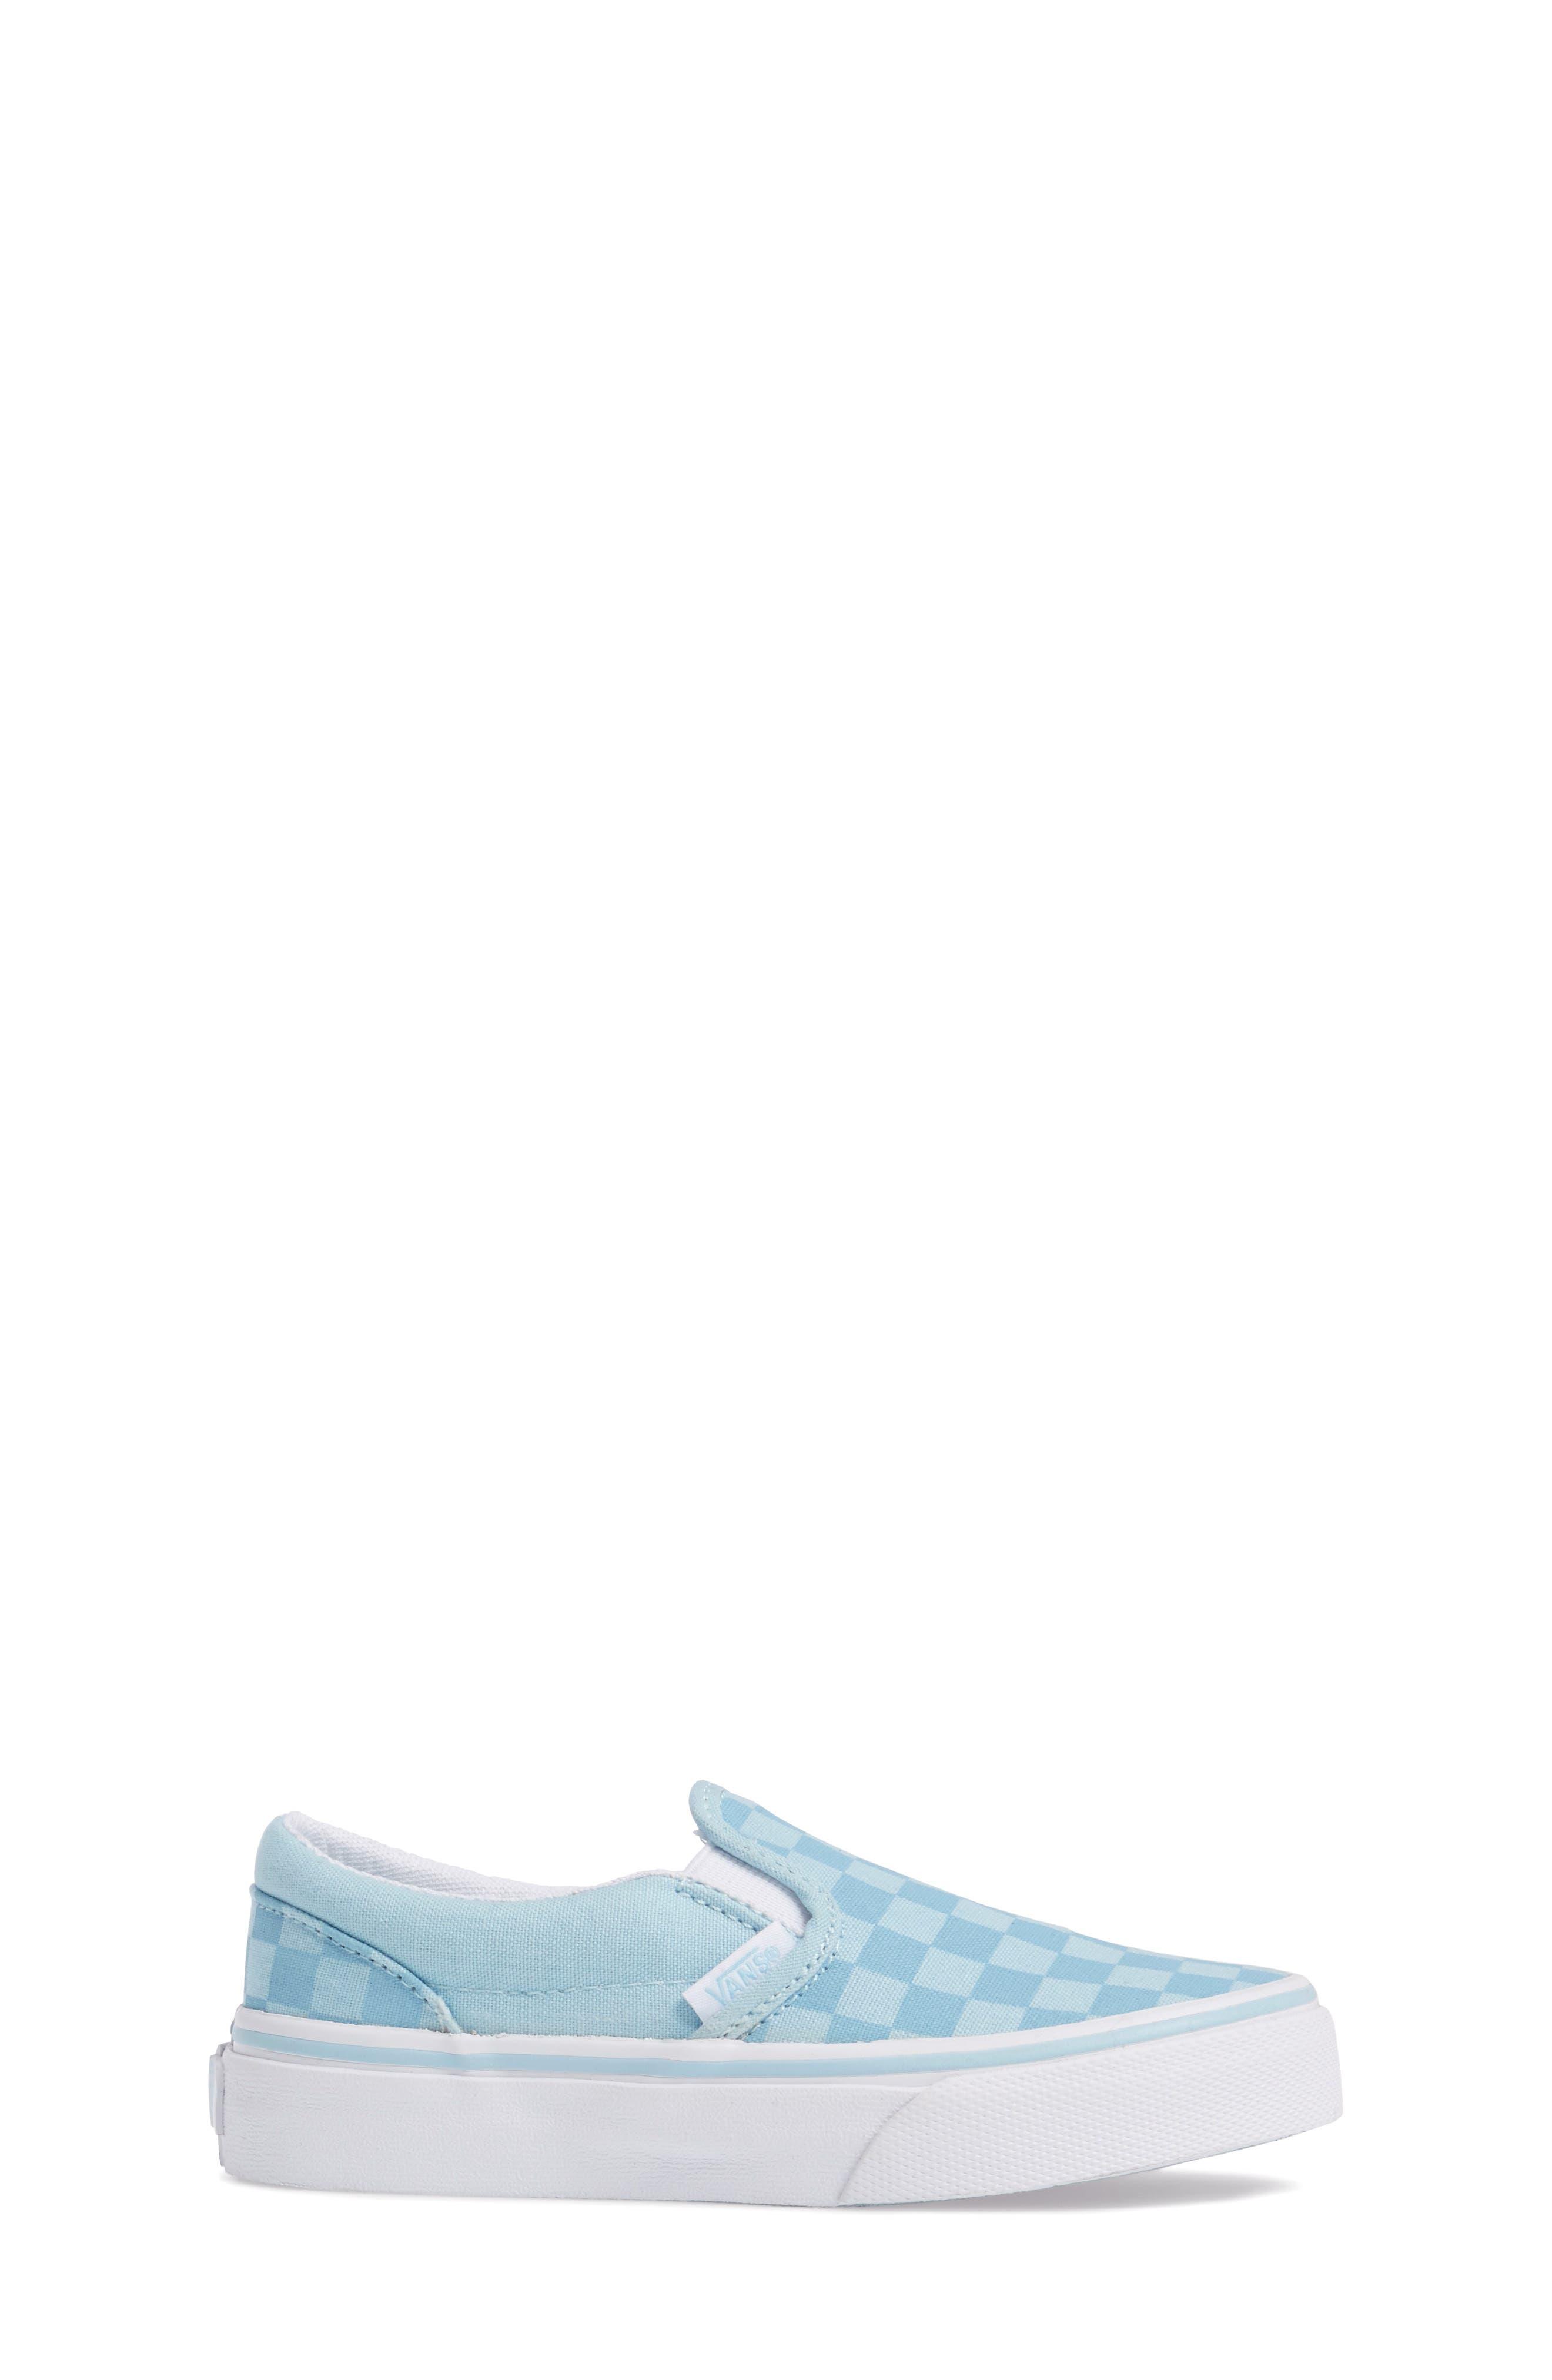 Classic Slip-On Sneaker,                             Alternate thumbnail 3, color,                             Crystal Blue Tonal Check